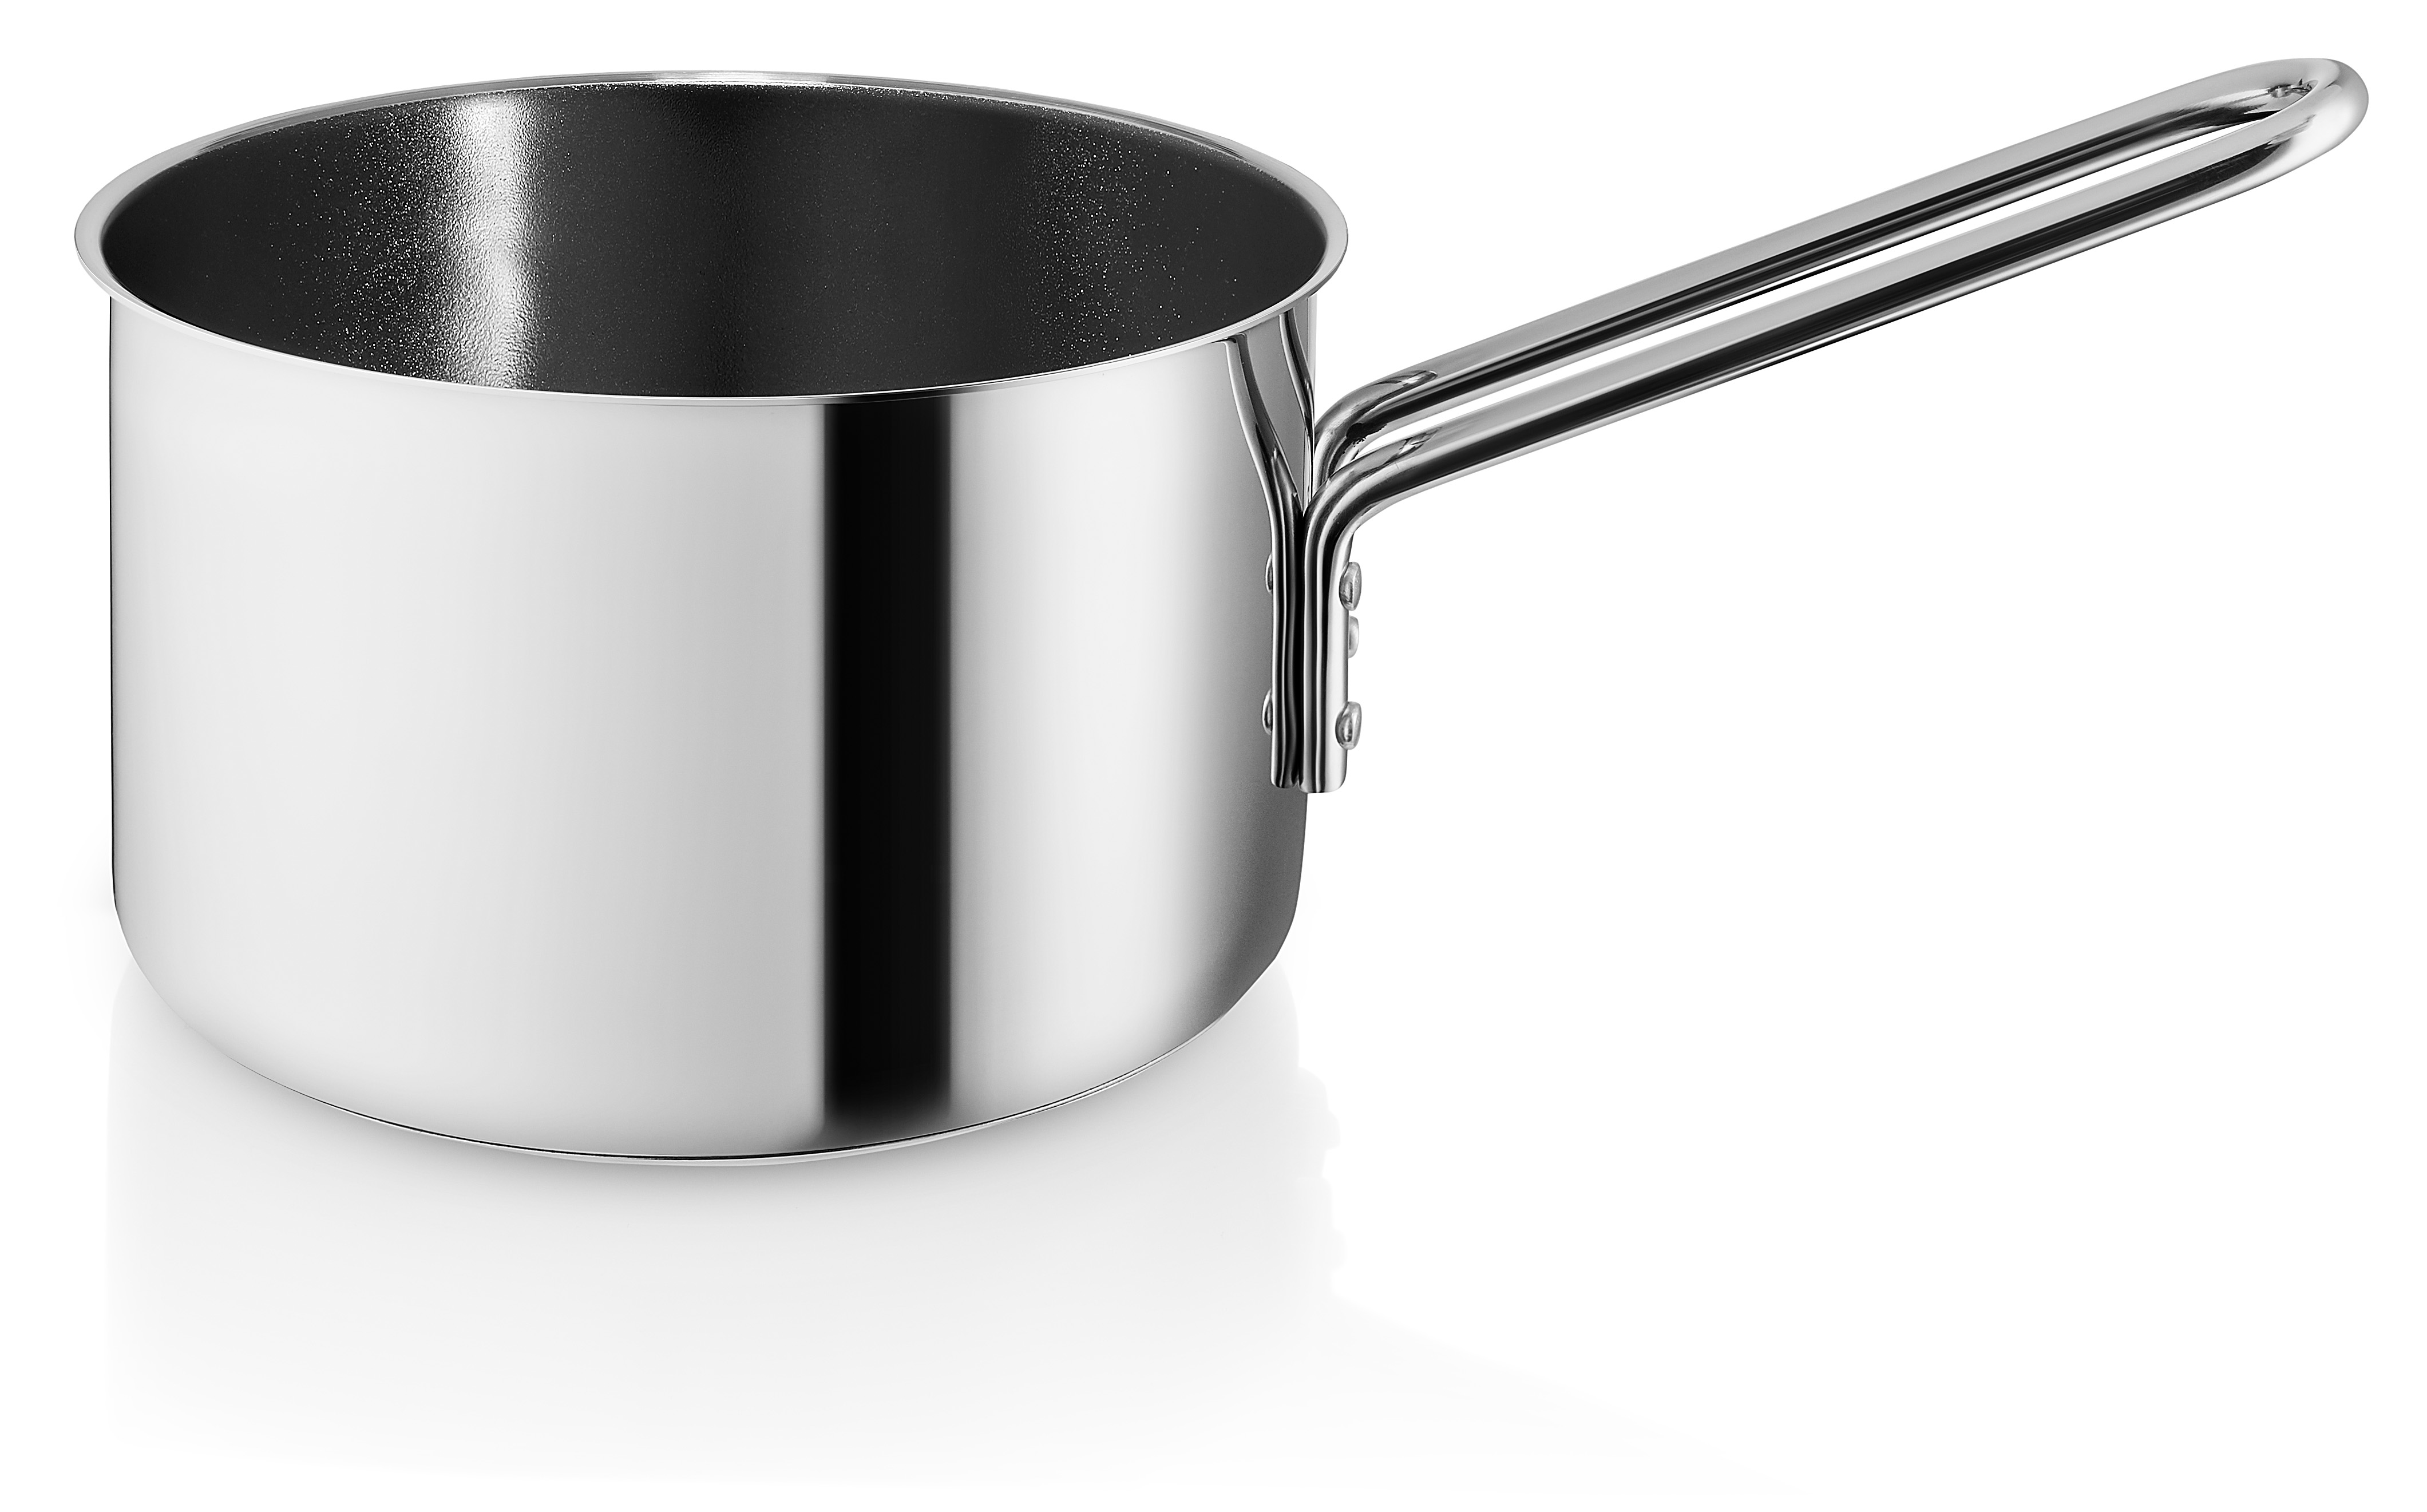 Eva Trio Rustfri stål kasserolle med keramisk belægning, 1,8 liter